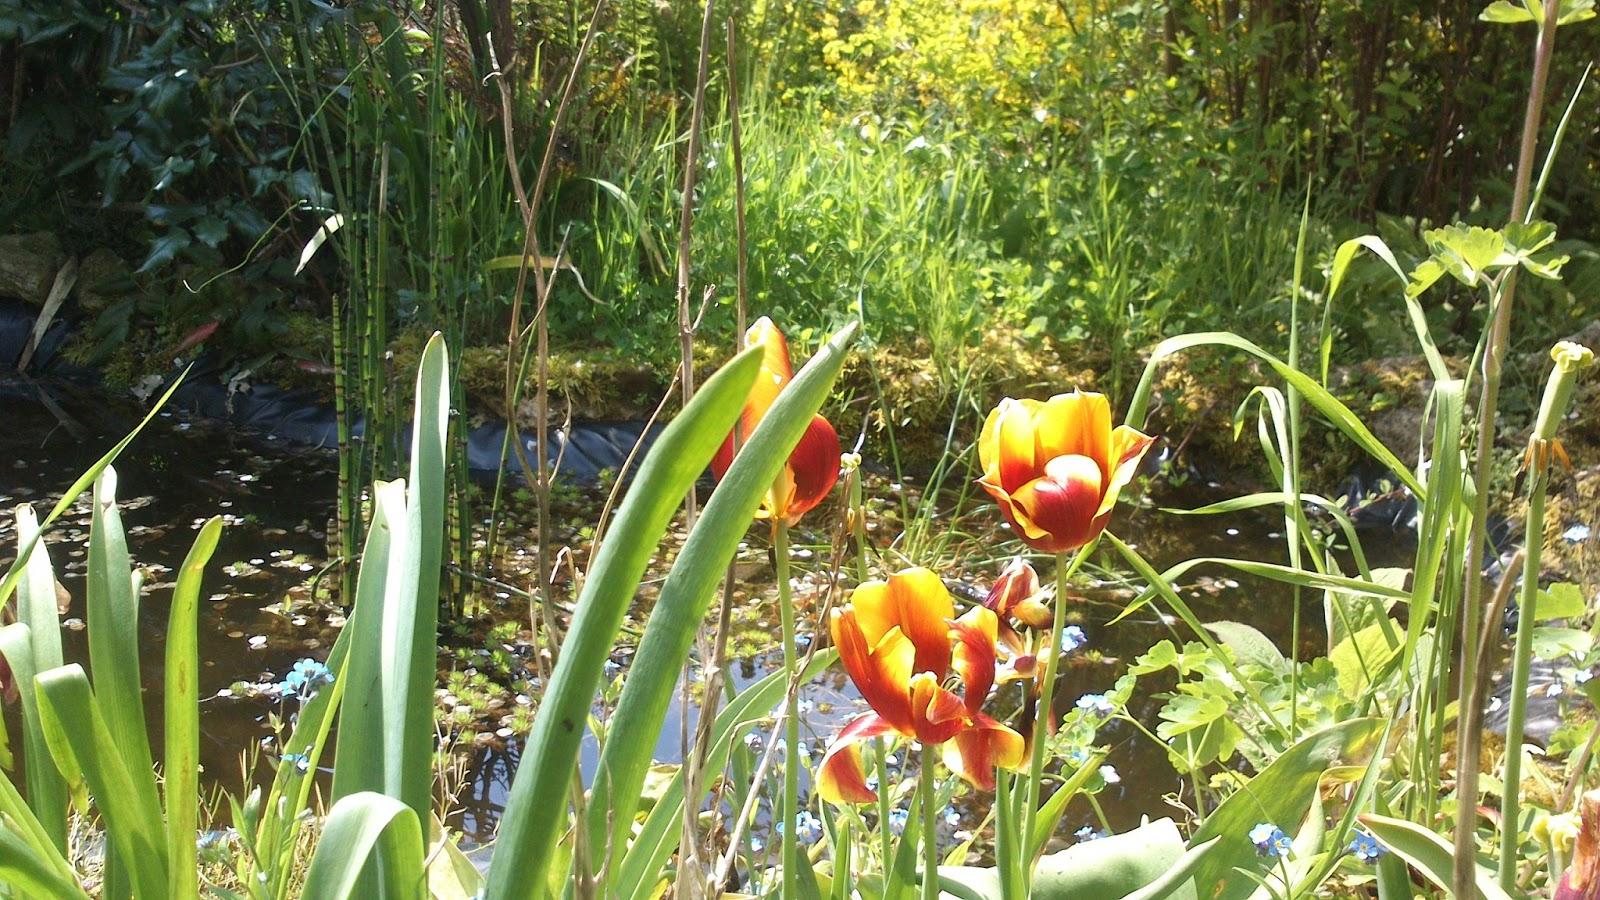 Naboo pop 39 s blog avril 2013 for Le jardin de catherien